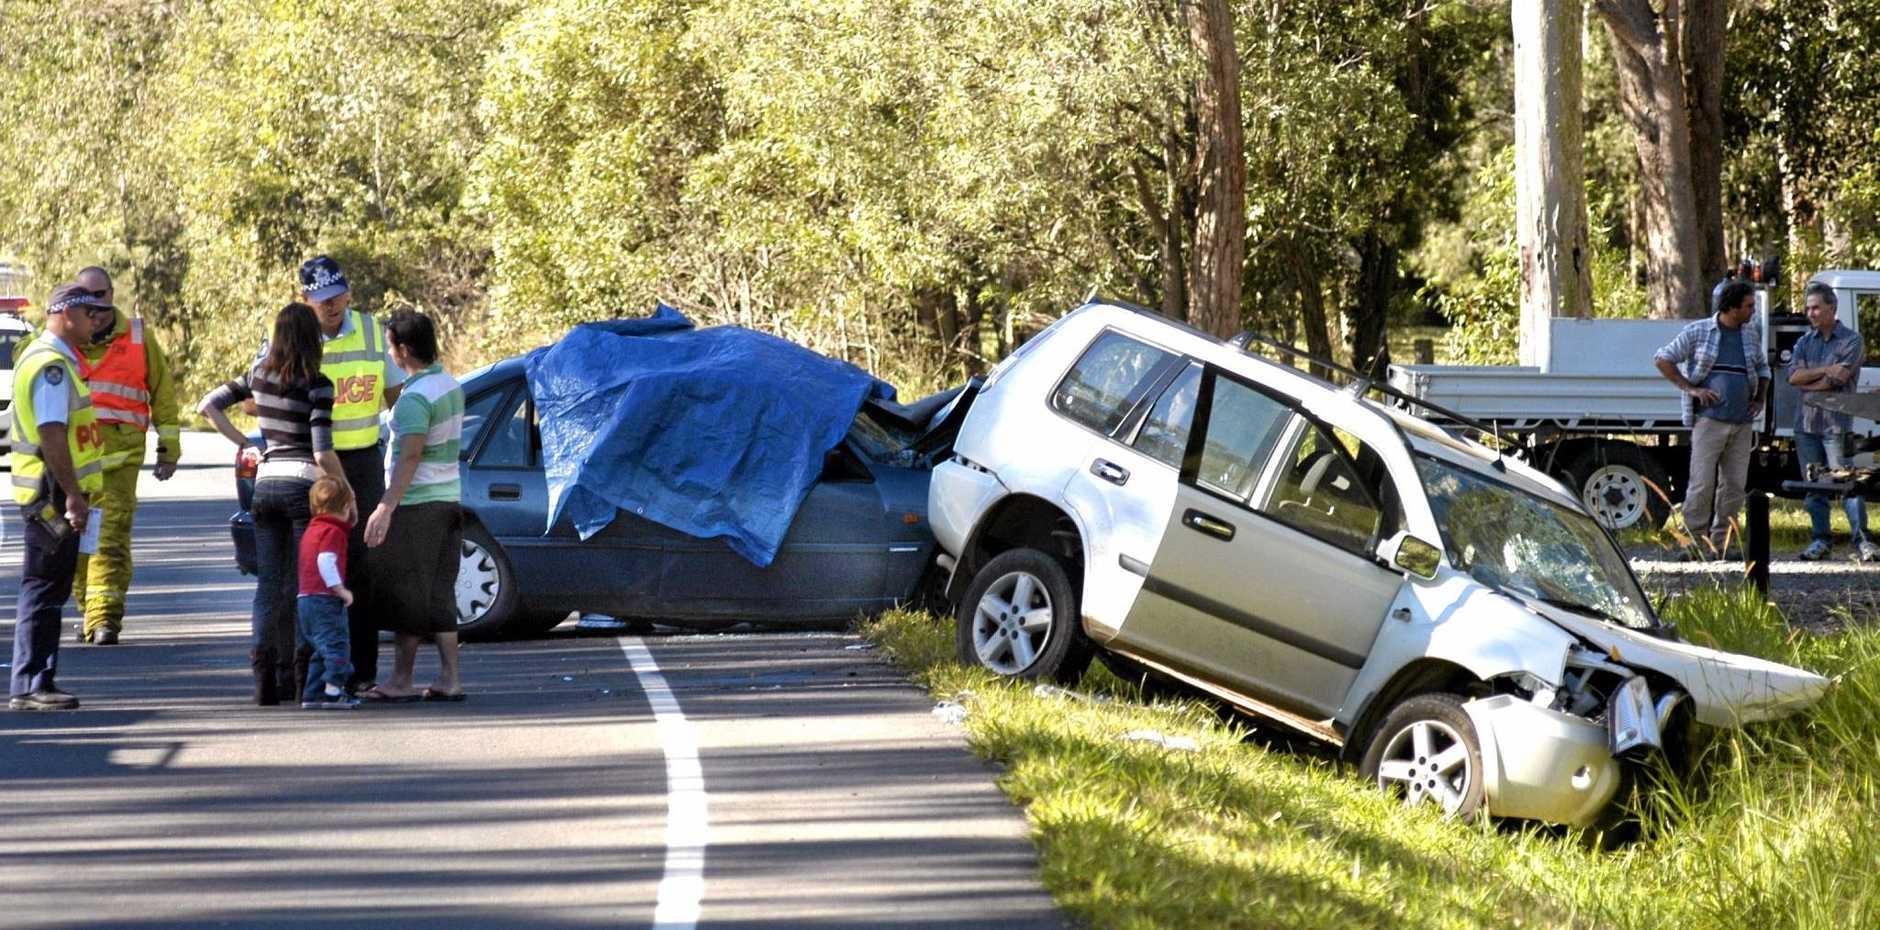 The scene of the crash in which Jayden Watt was killed on Noosa-Cooroy Rd in 2007.